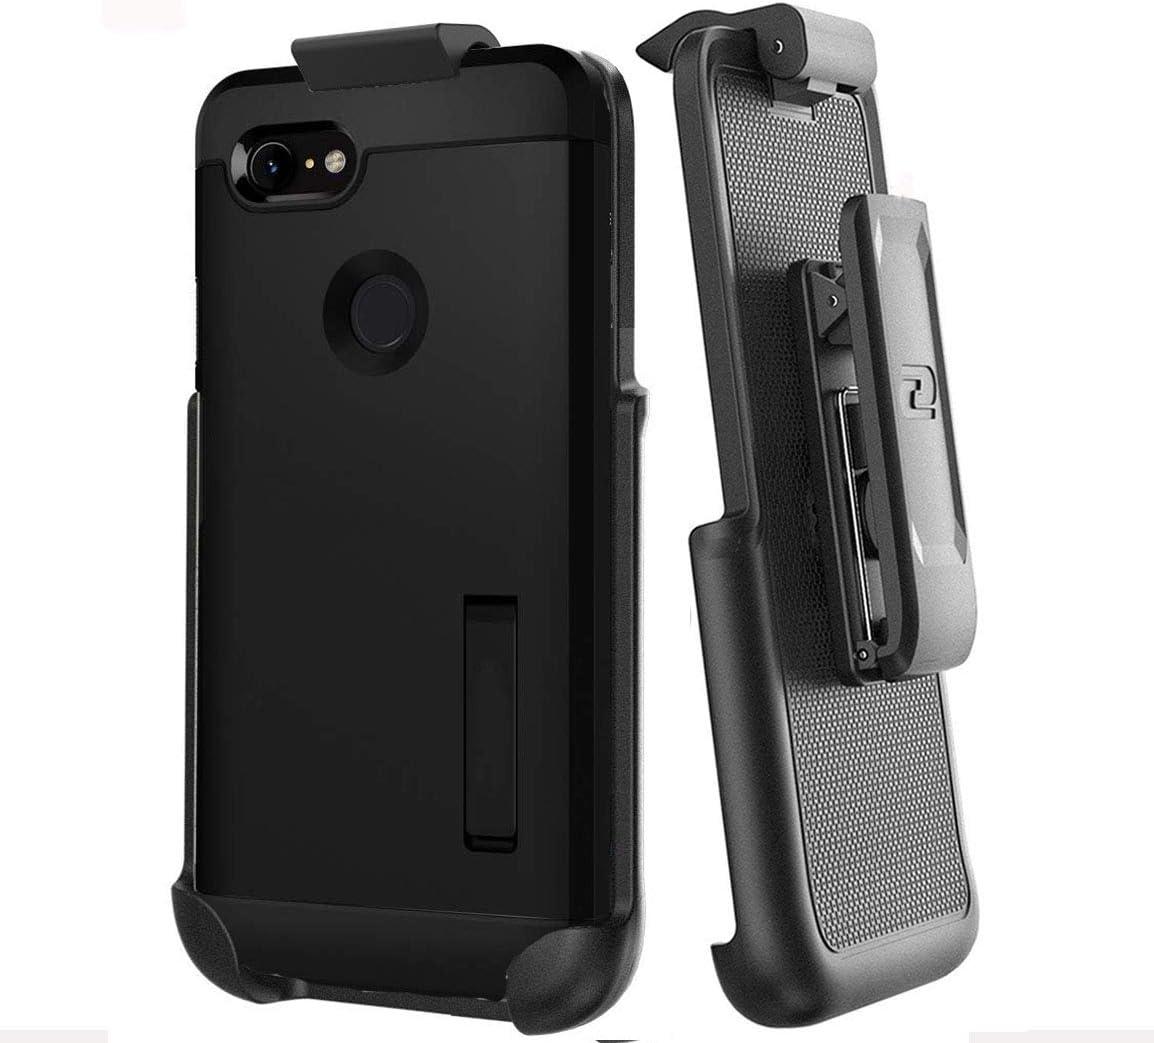 Encased Belt Clip Holster Compatible with Spigen Tough Armor Case - Google Pixel 3 XL (case not Included)